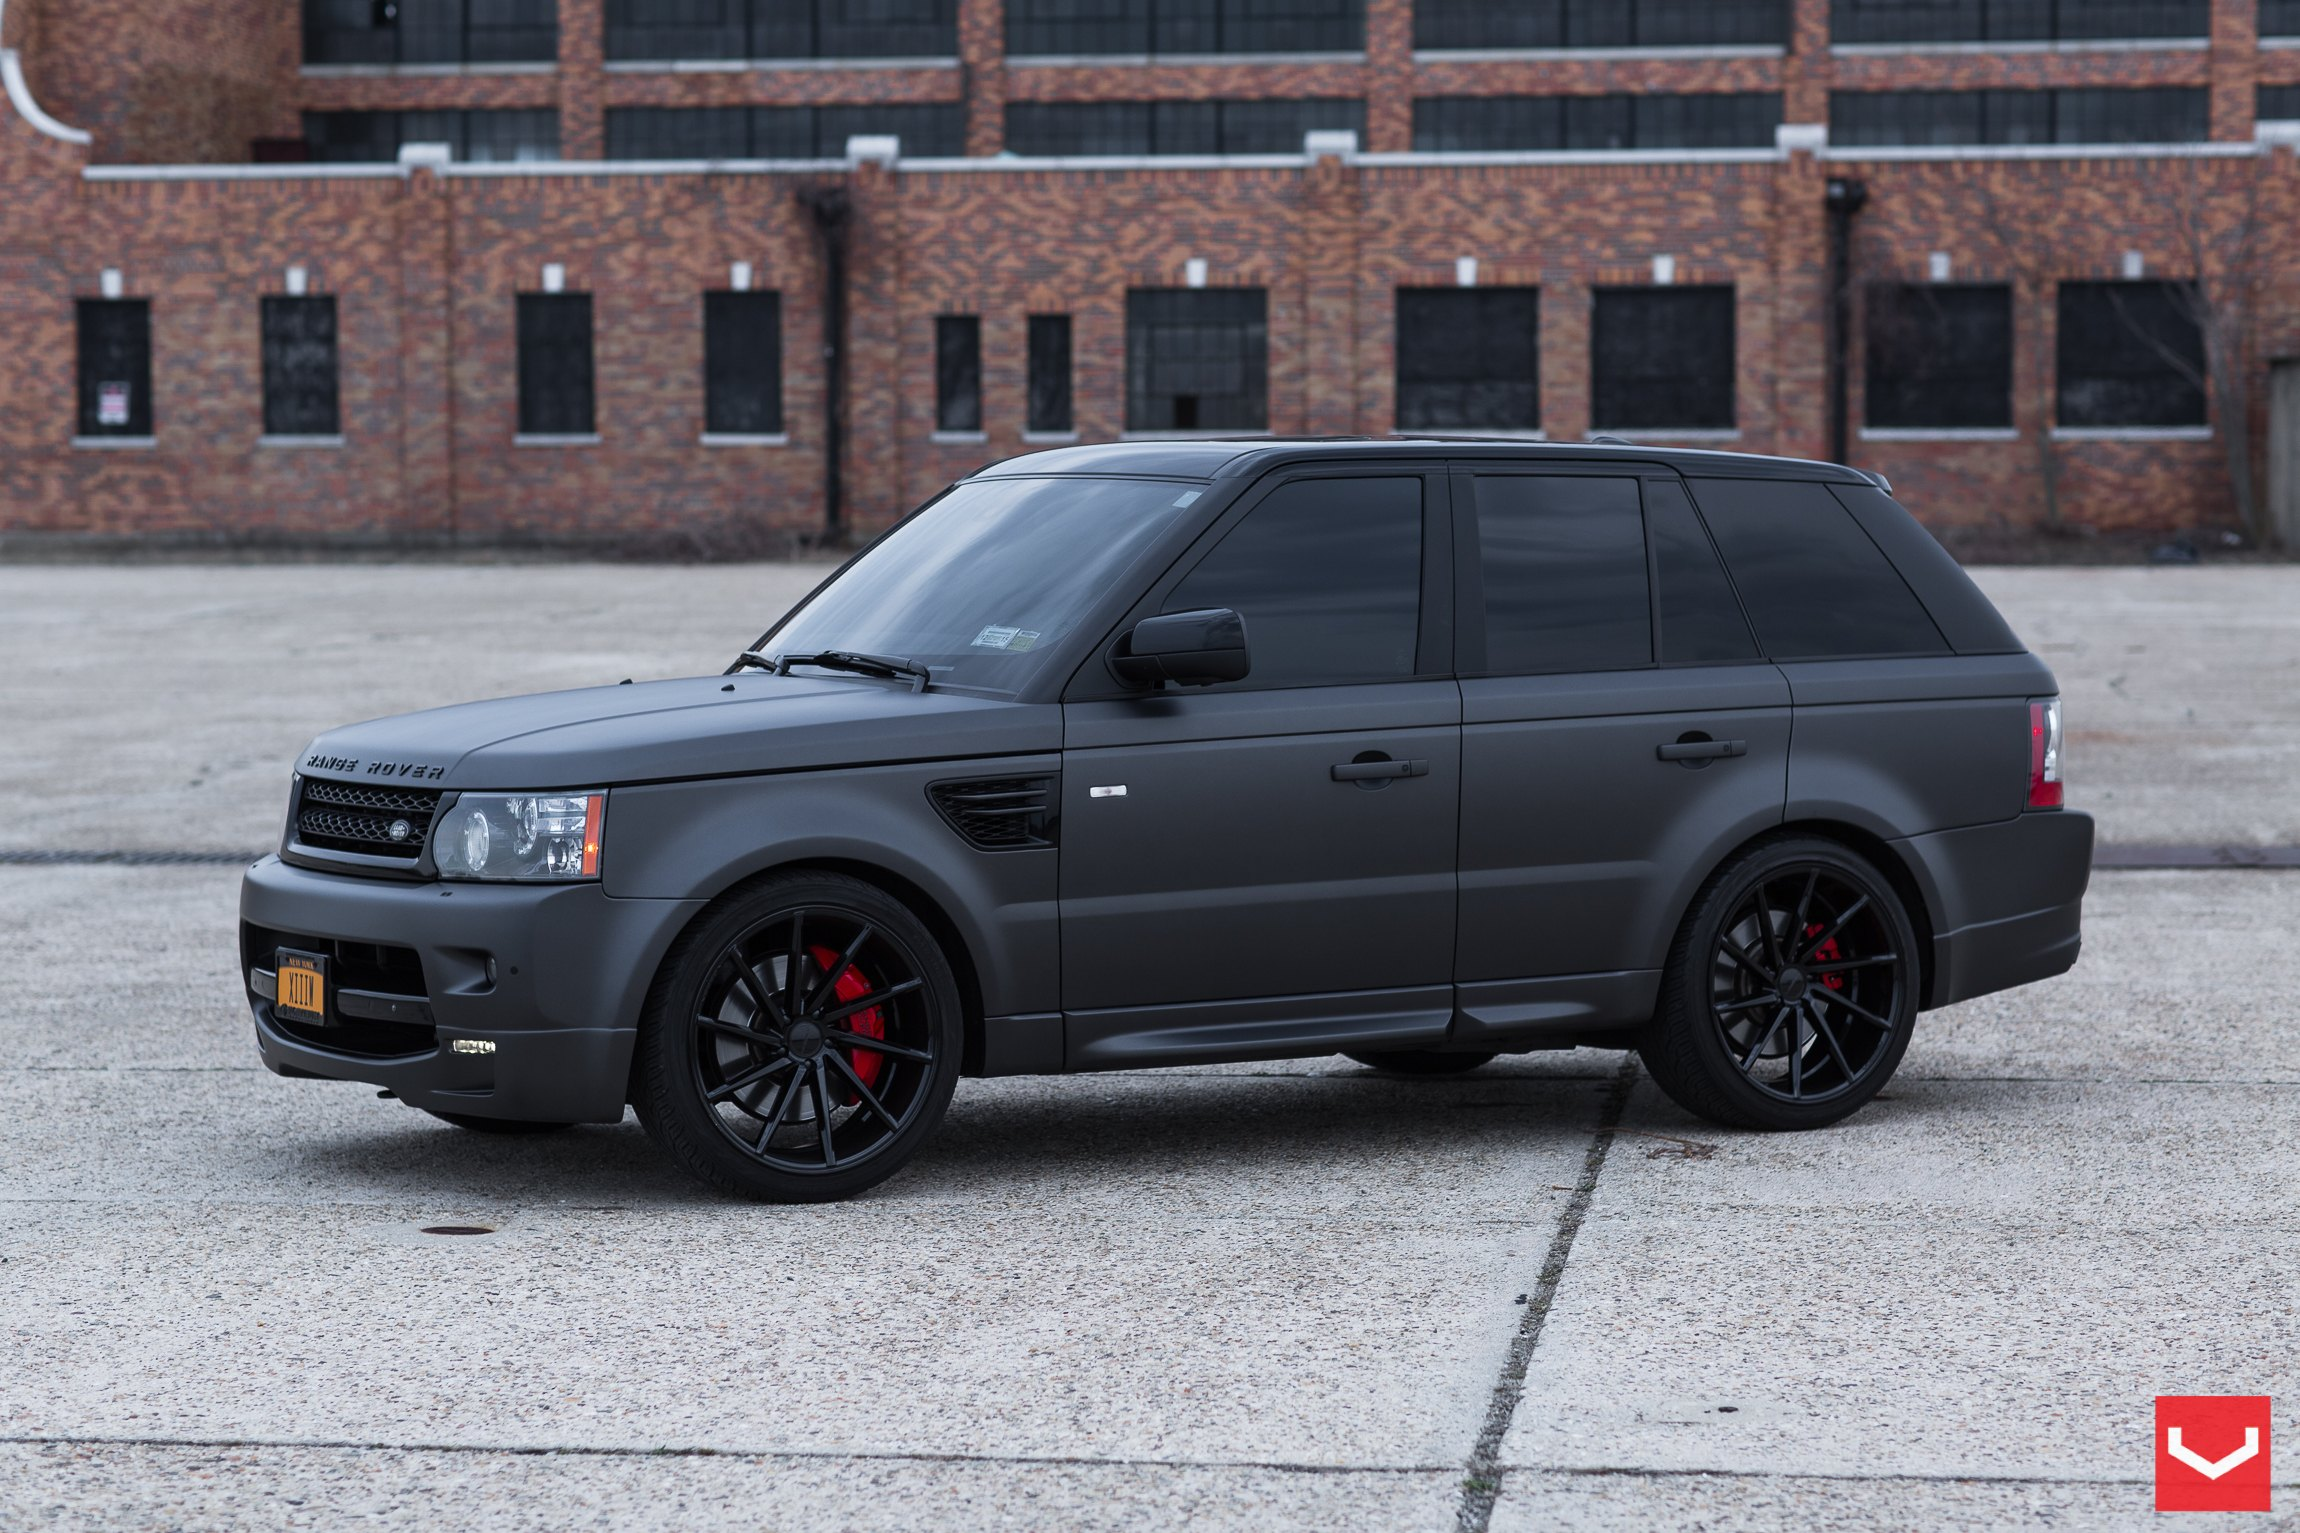 Black On Black: Matte Land Rover Range Rover Sport With